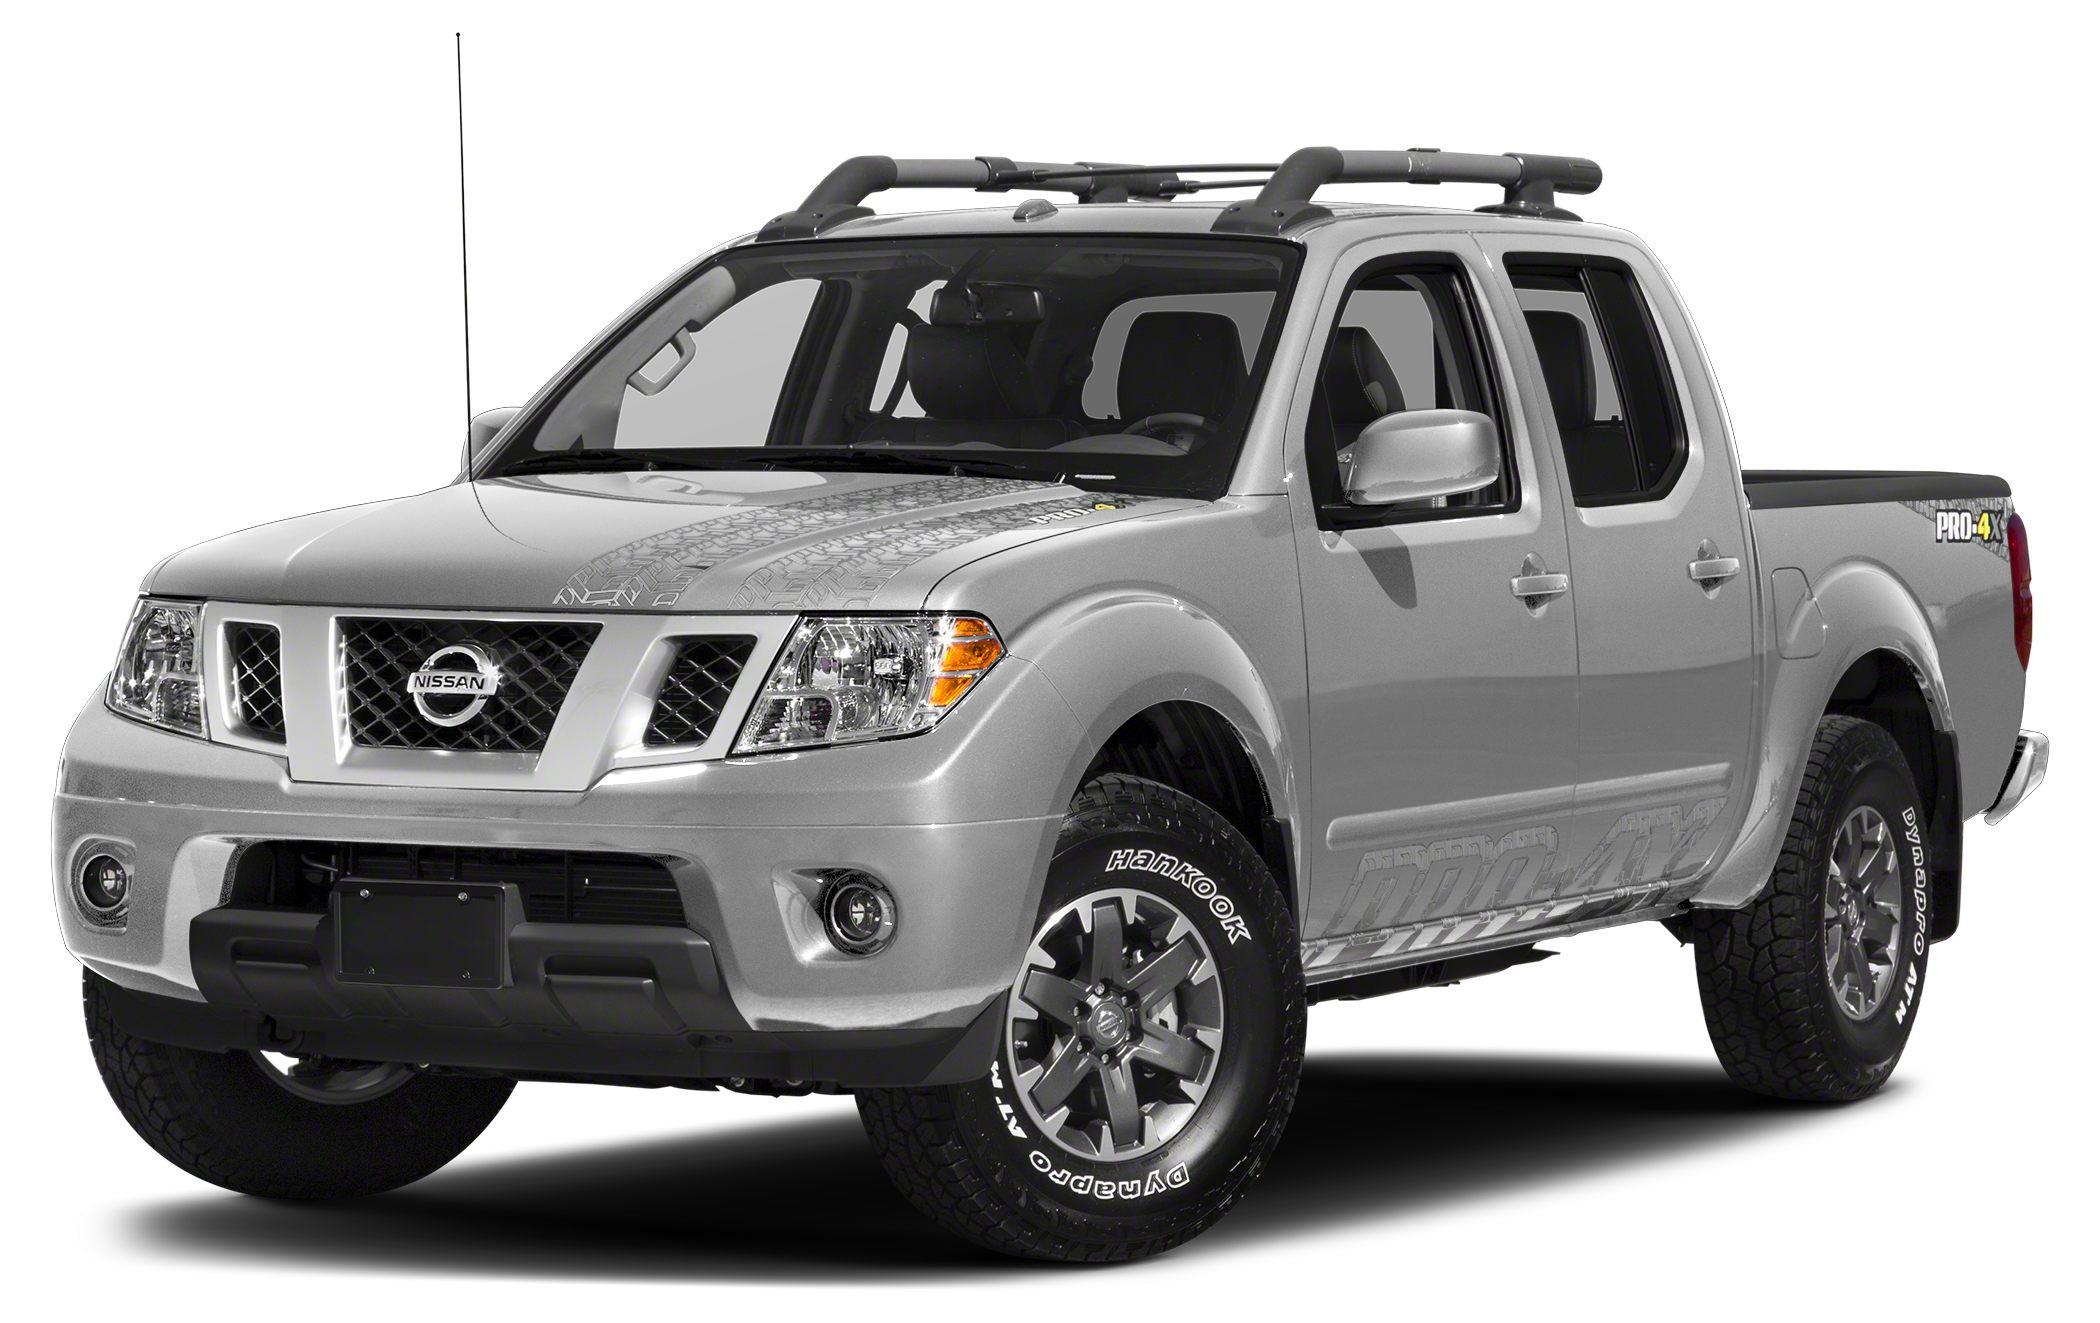 2016 Nissan Frontier PRO-4X 2016 Nissan Frontier PRO PRO-4X Luxury Package 4-Way Heated Power Pa